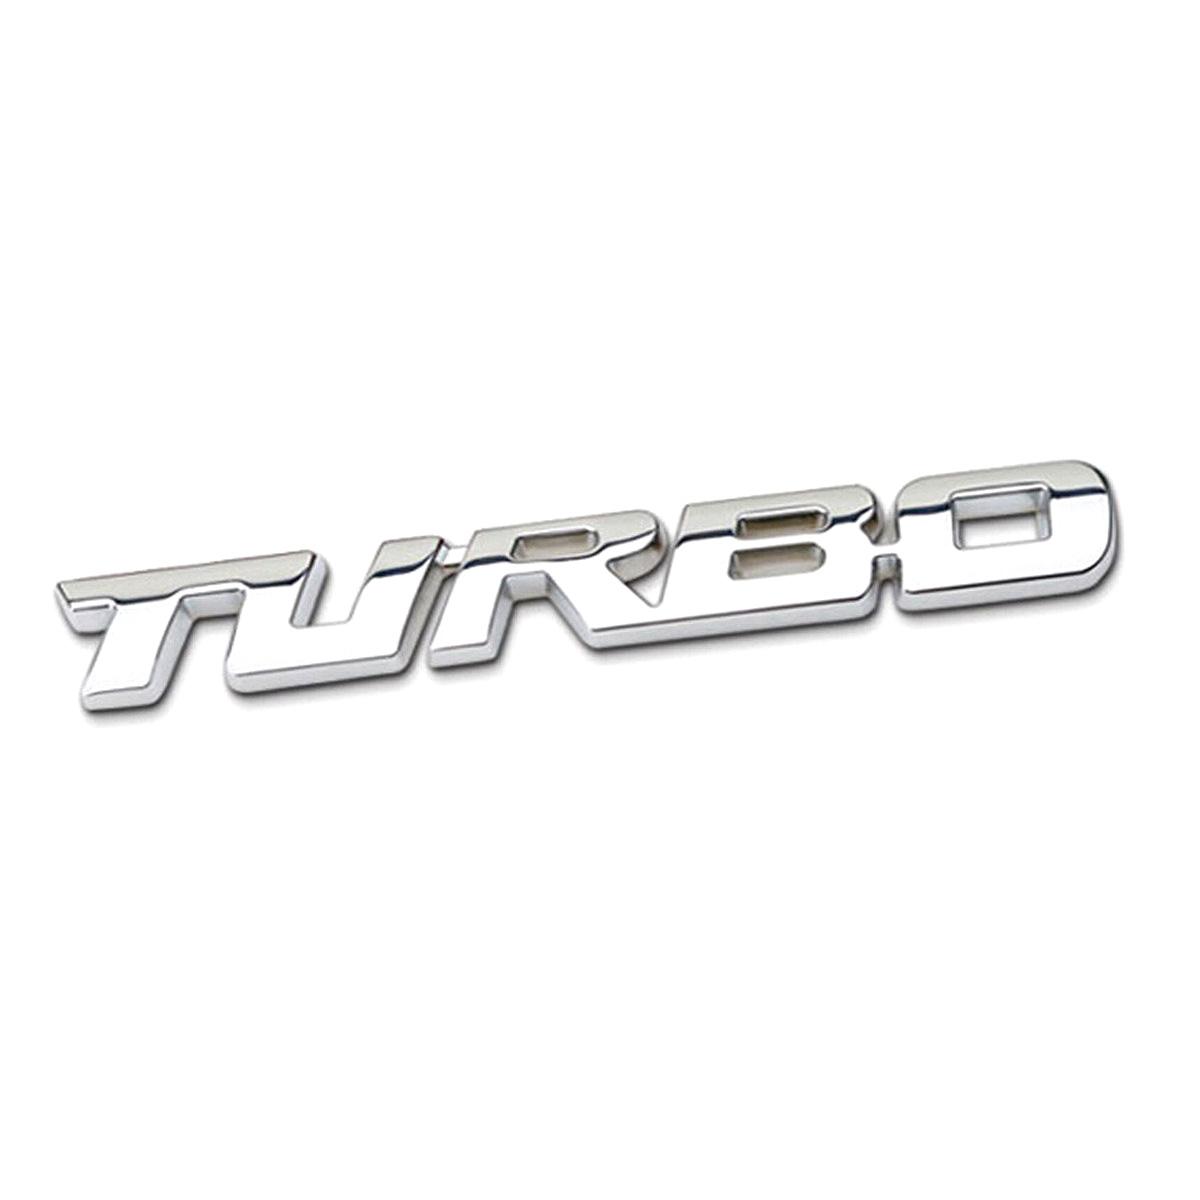 3D Metal Chrome Turbo Trunk Tailgate Car Auto Blue Emblem Badge Decal Sticker